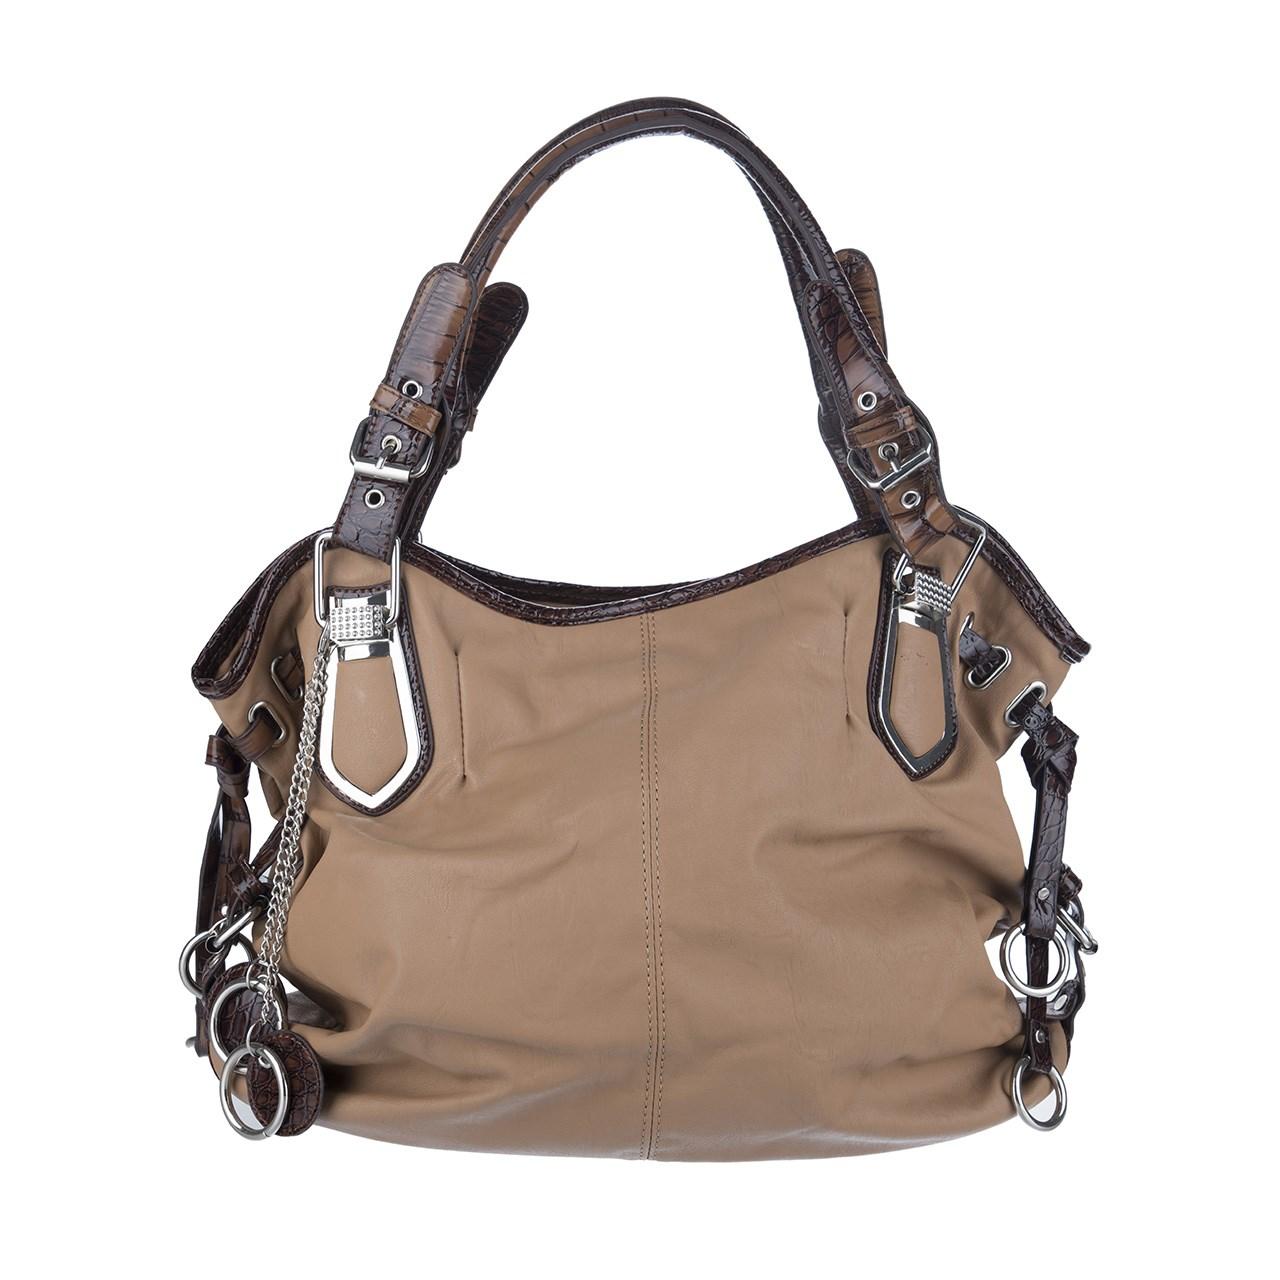 کیف دستی زنانه ویلیج کد 39